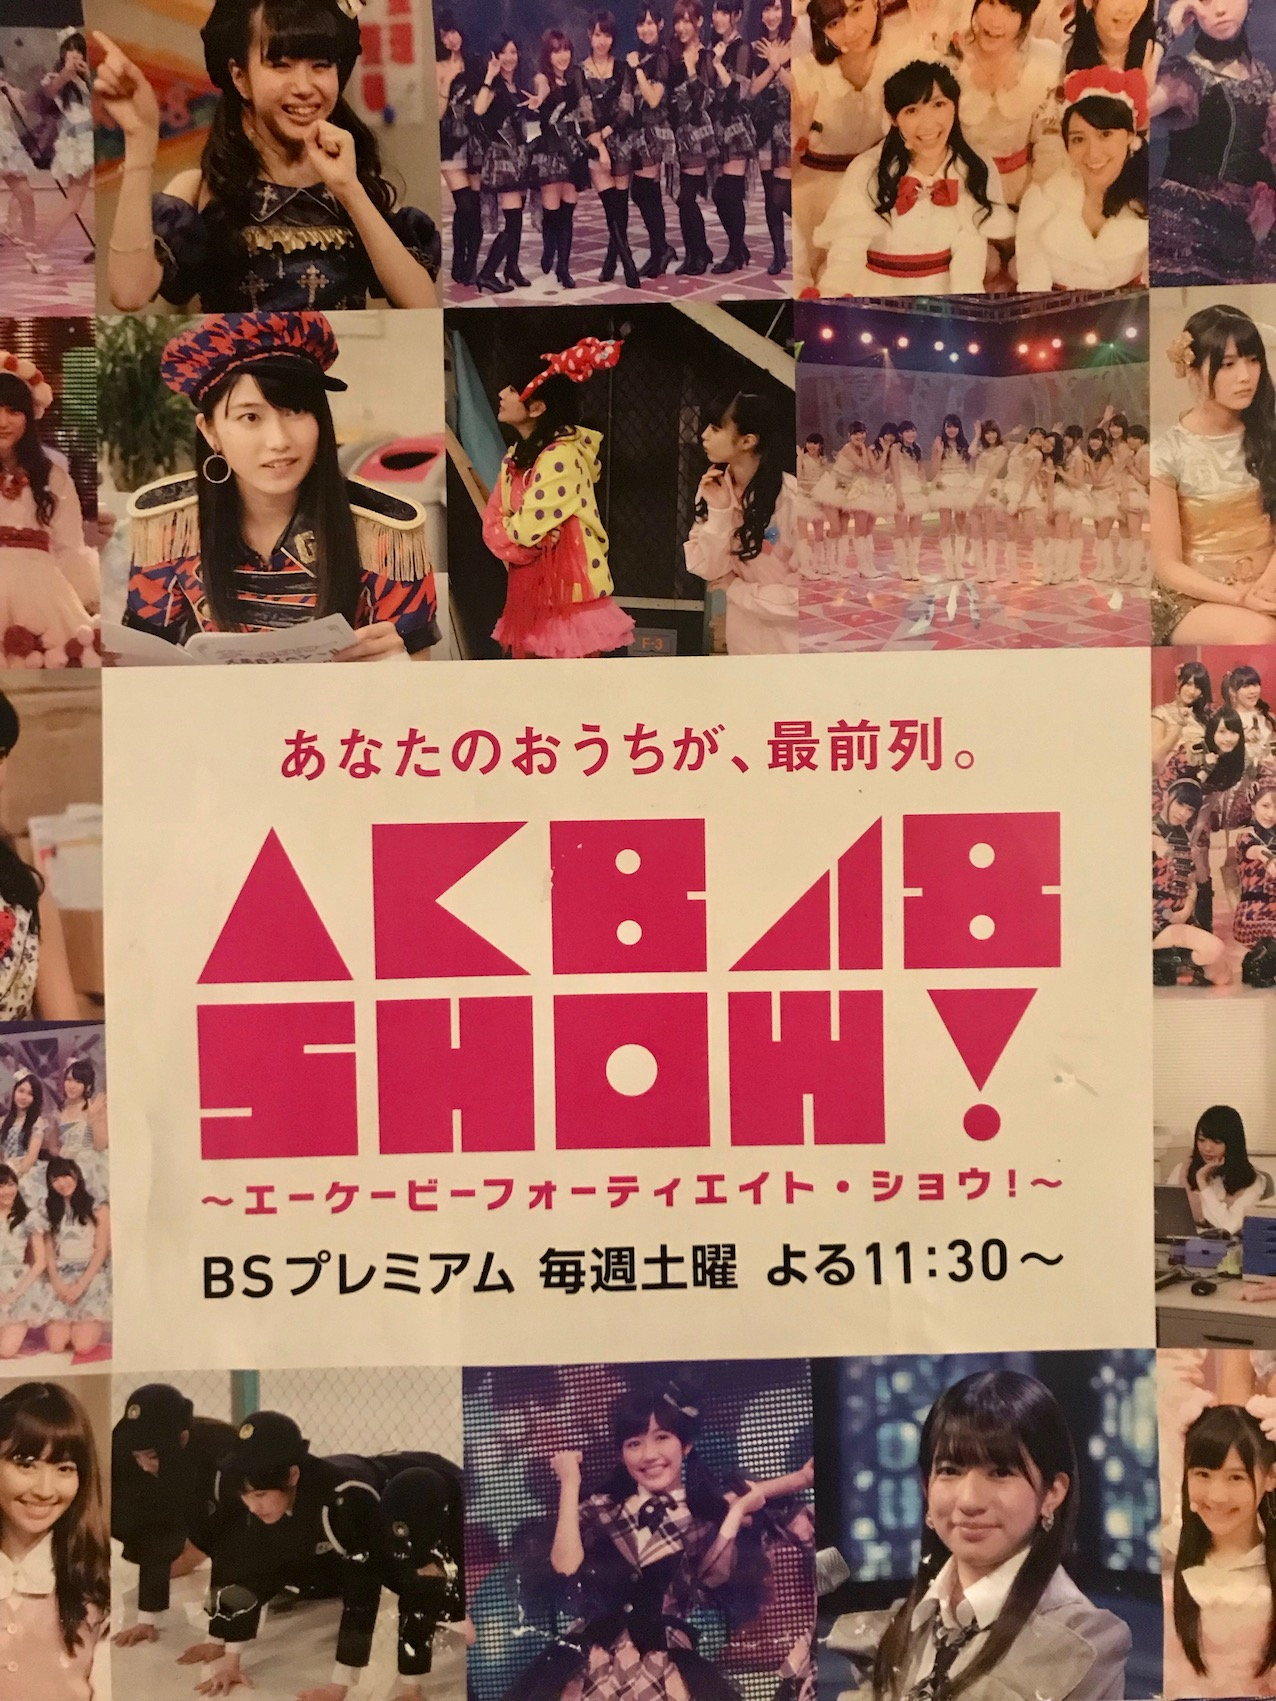 AKB48 Live at Don Quijote Akihabara Electric Town Tokyo